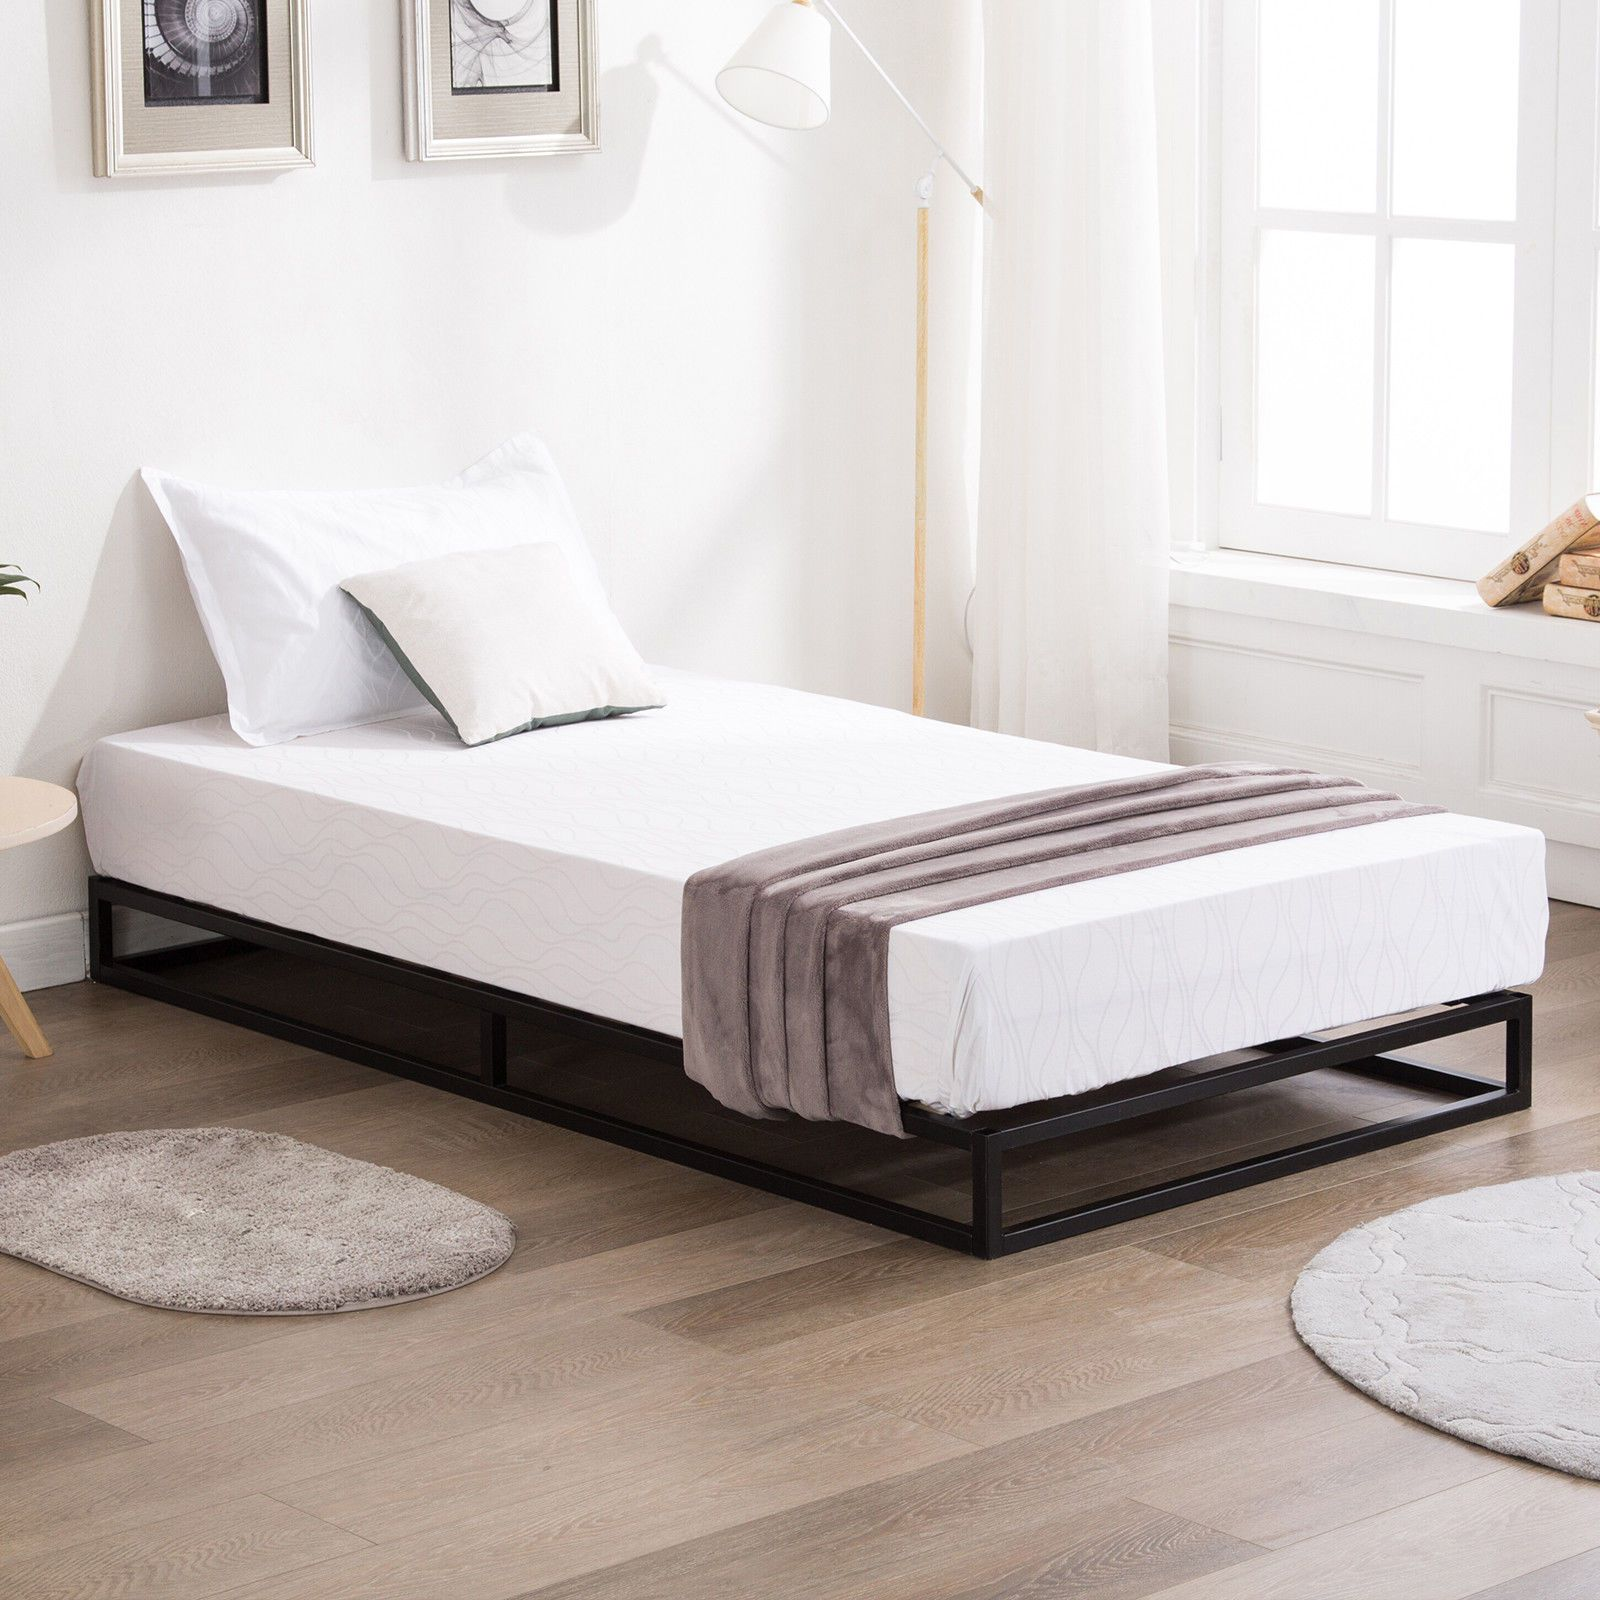 Twin/Full/Queen/King Metal Platform Bed Frame Wood Slats